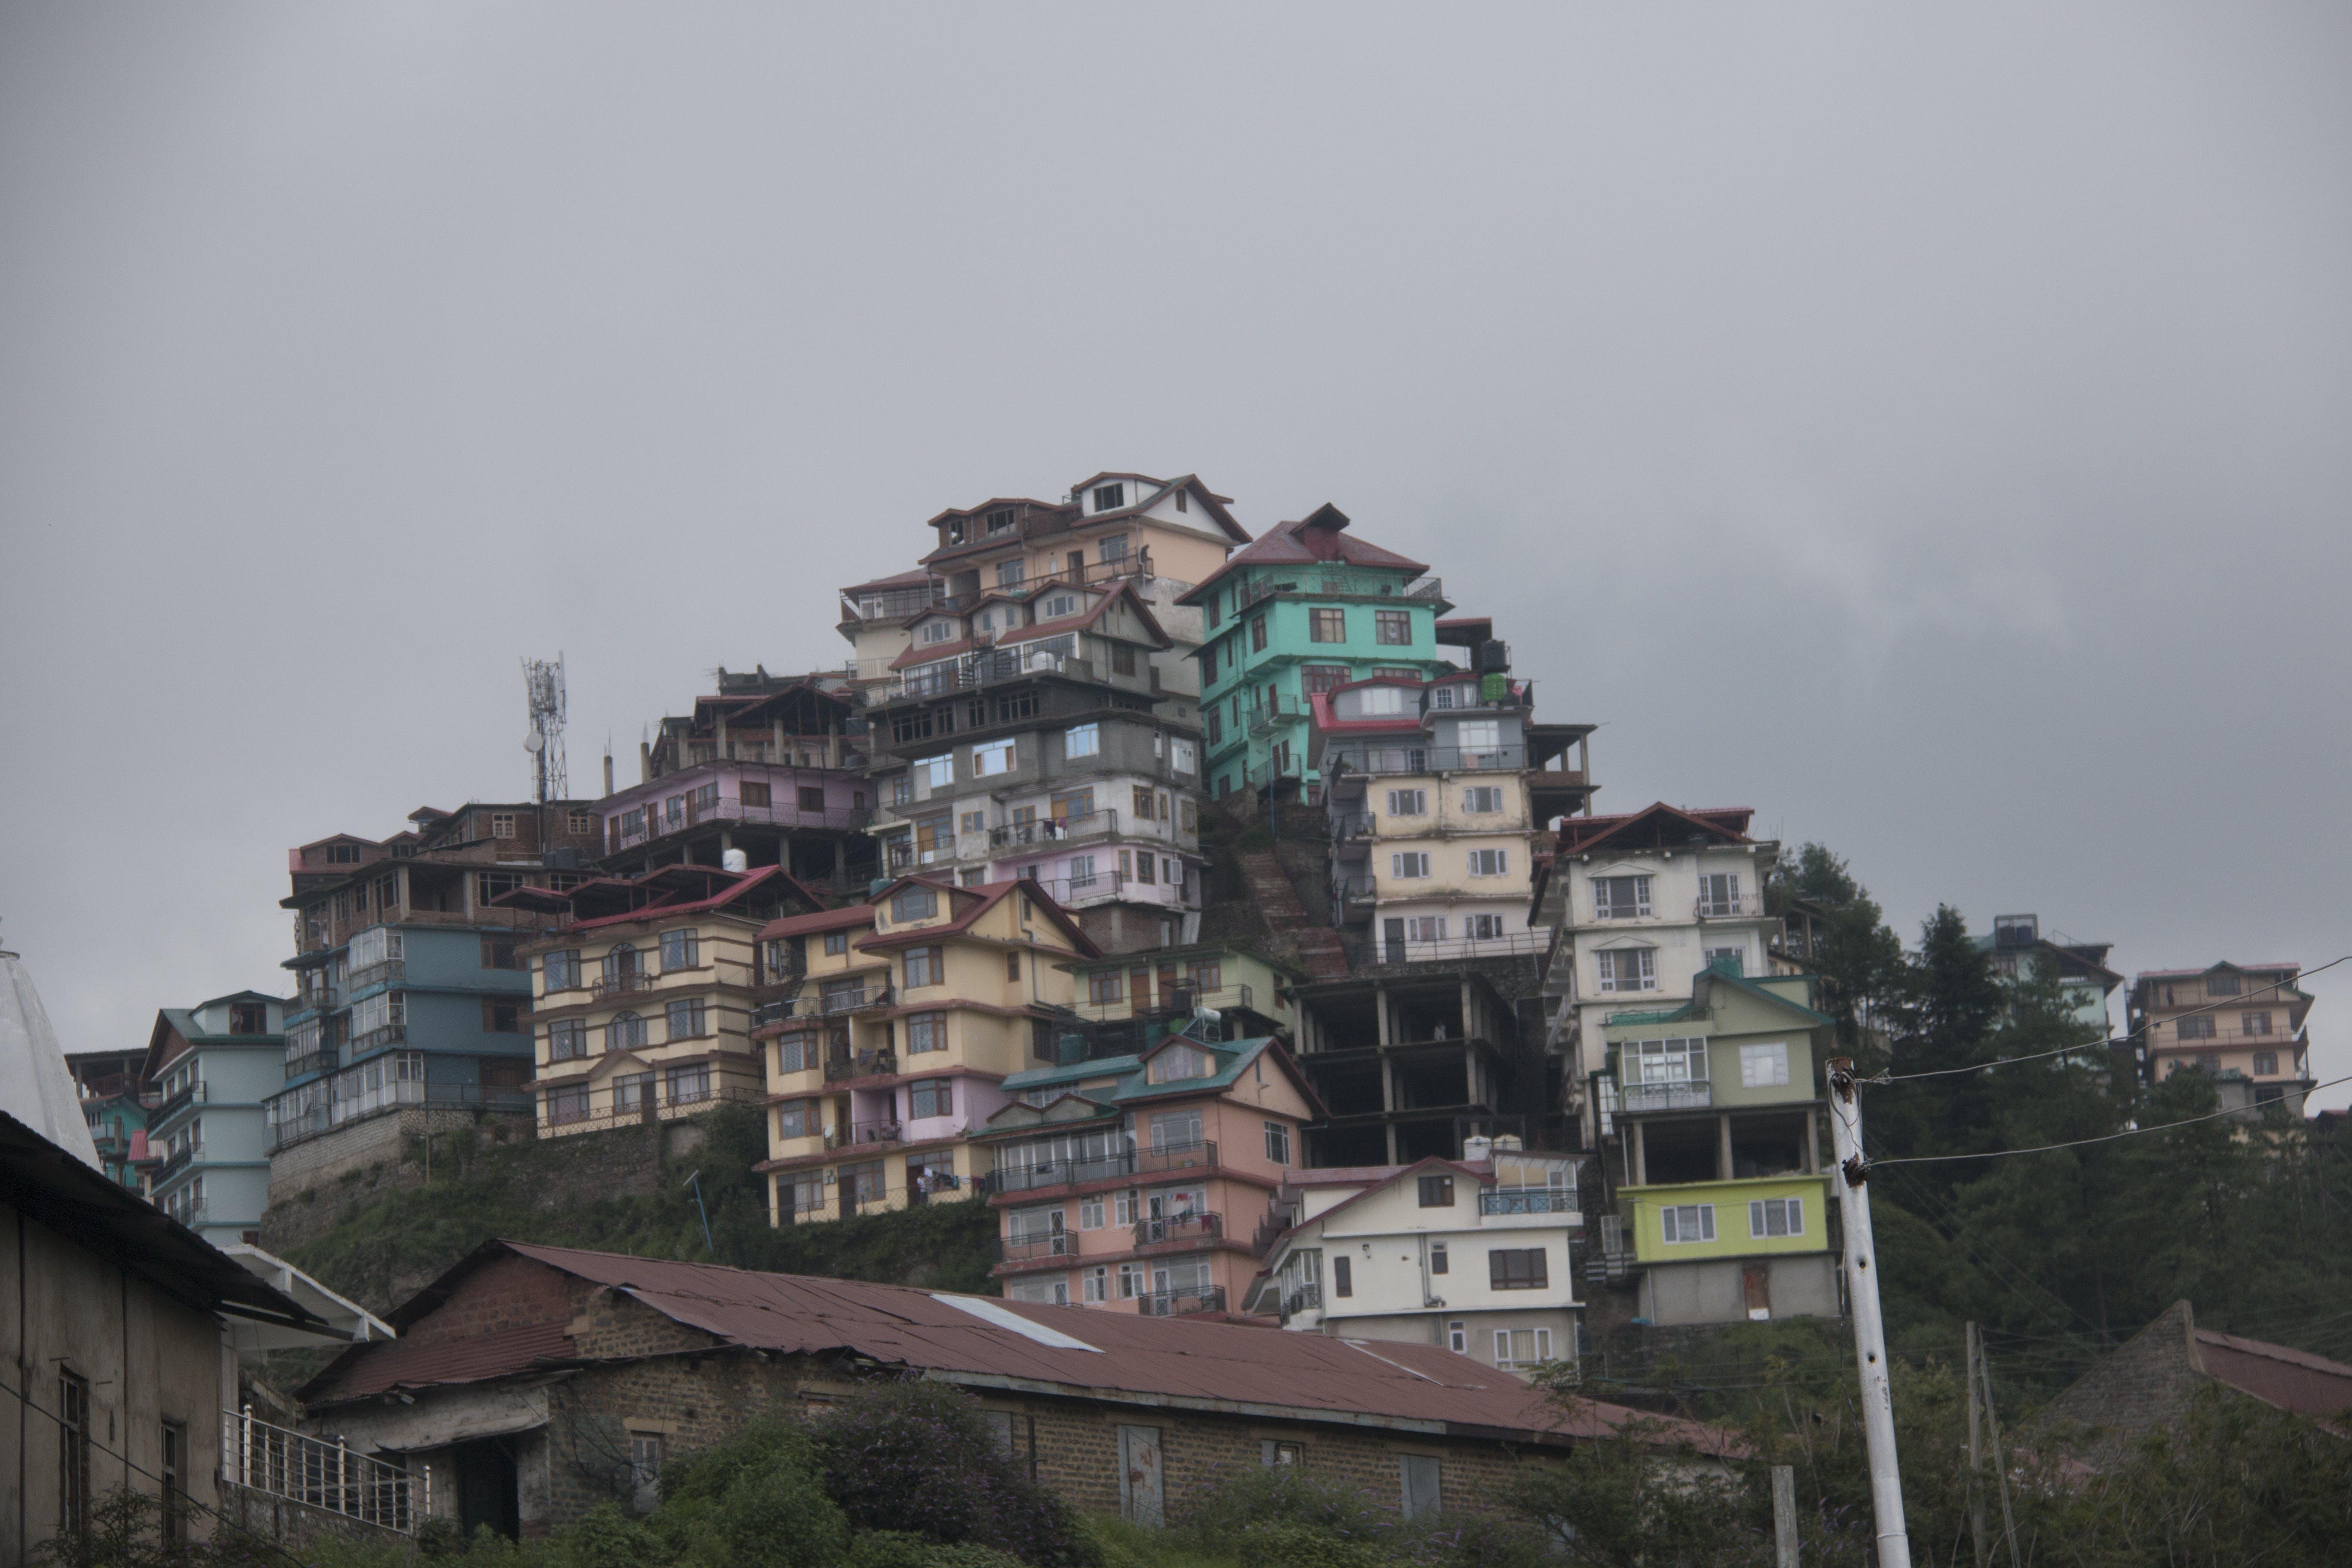 Free stock photo of #shimla #city #india #life #nature #old